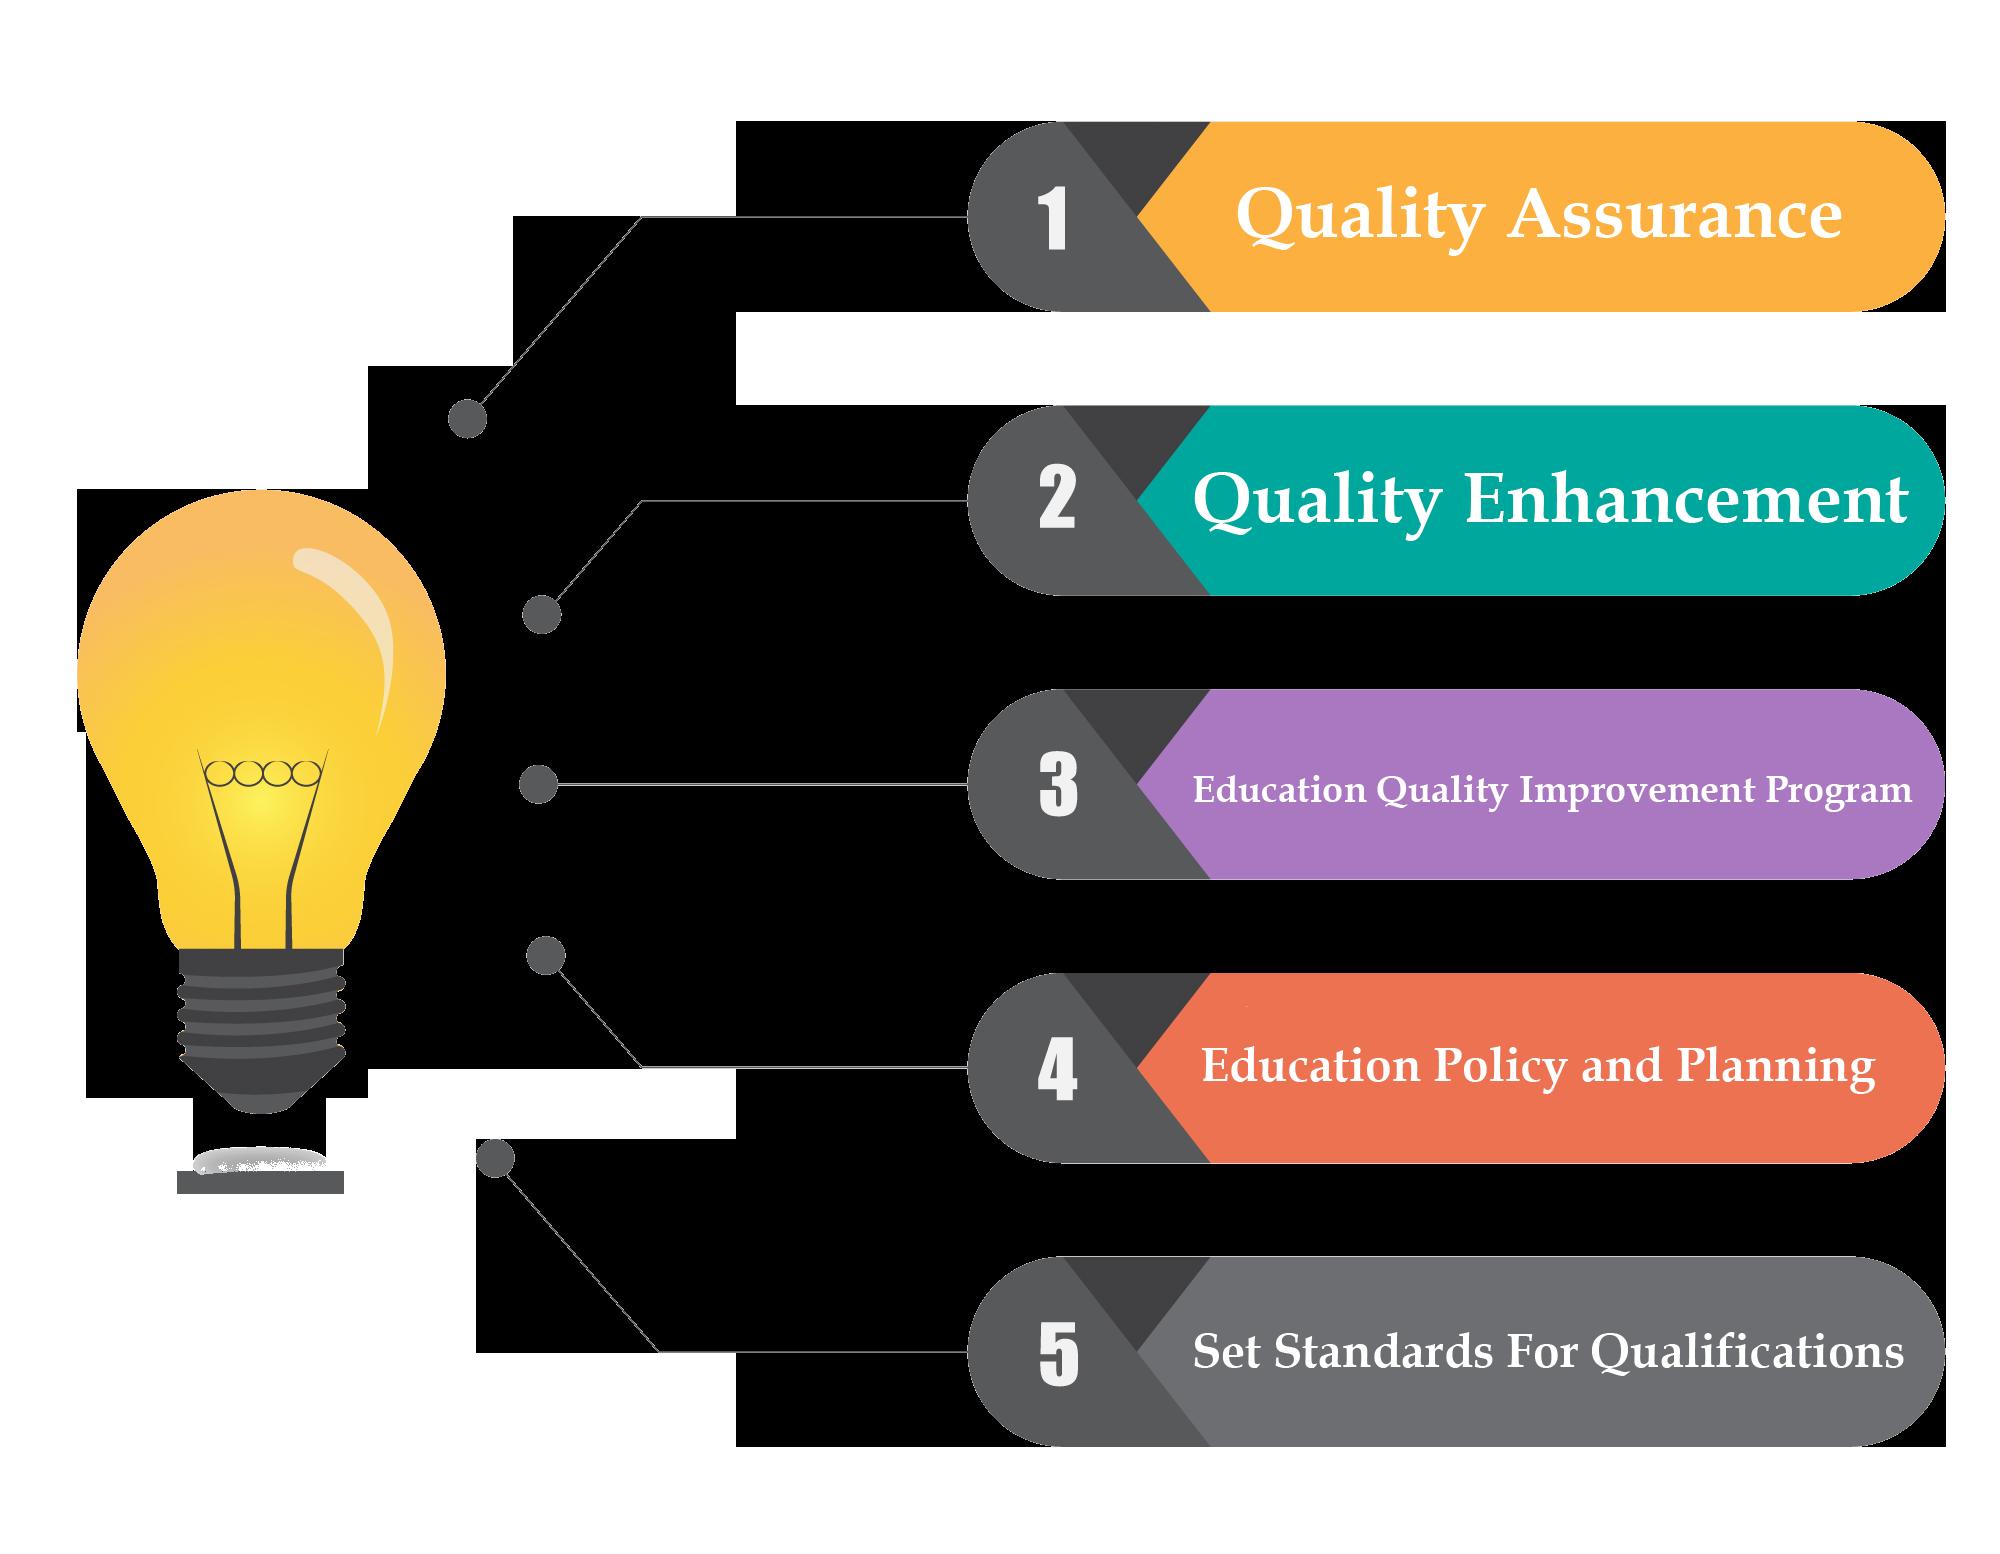 Planning clipart qualification. Eqfm education quality framework